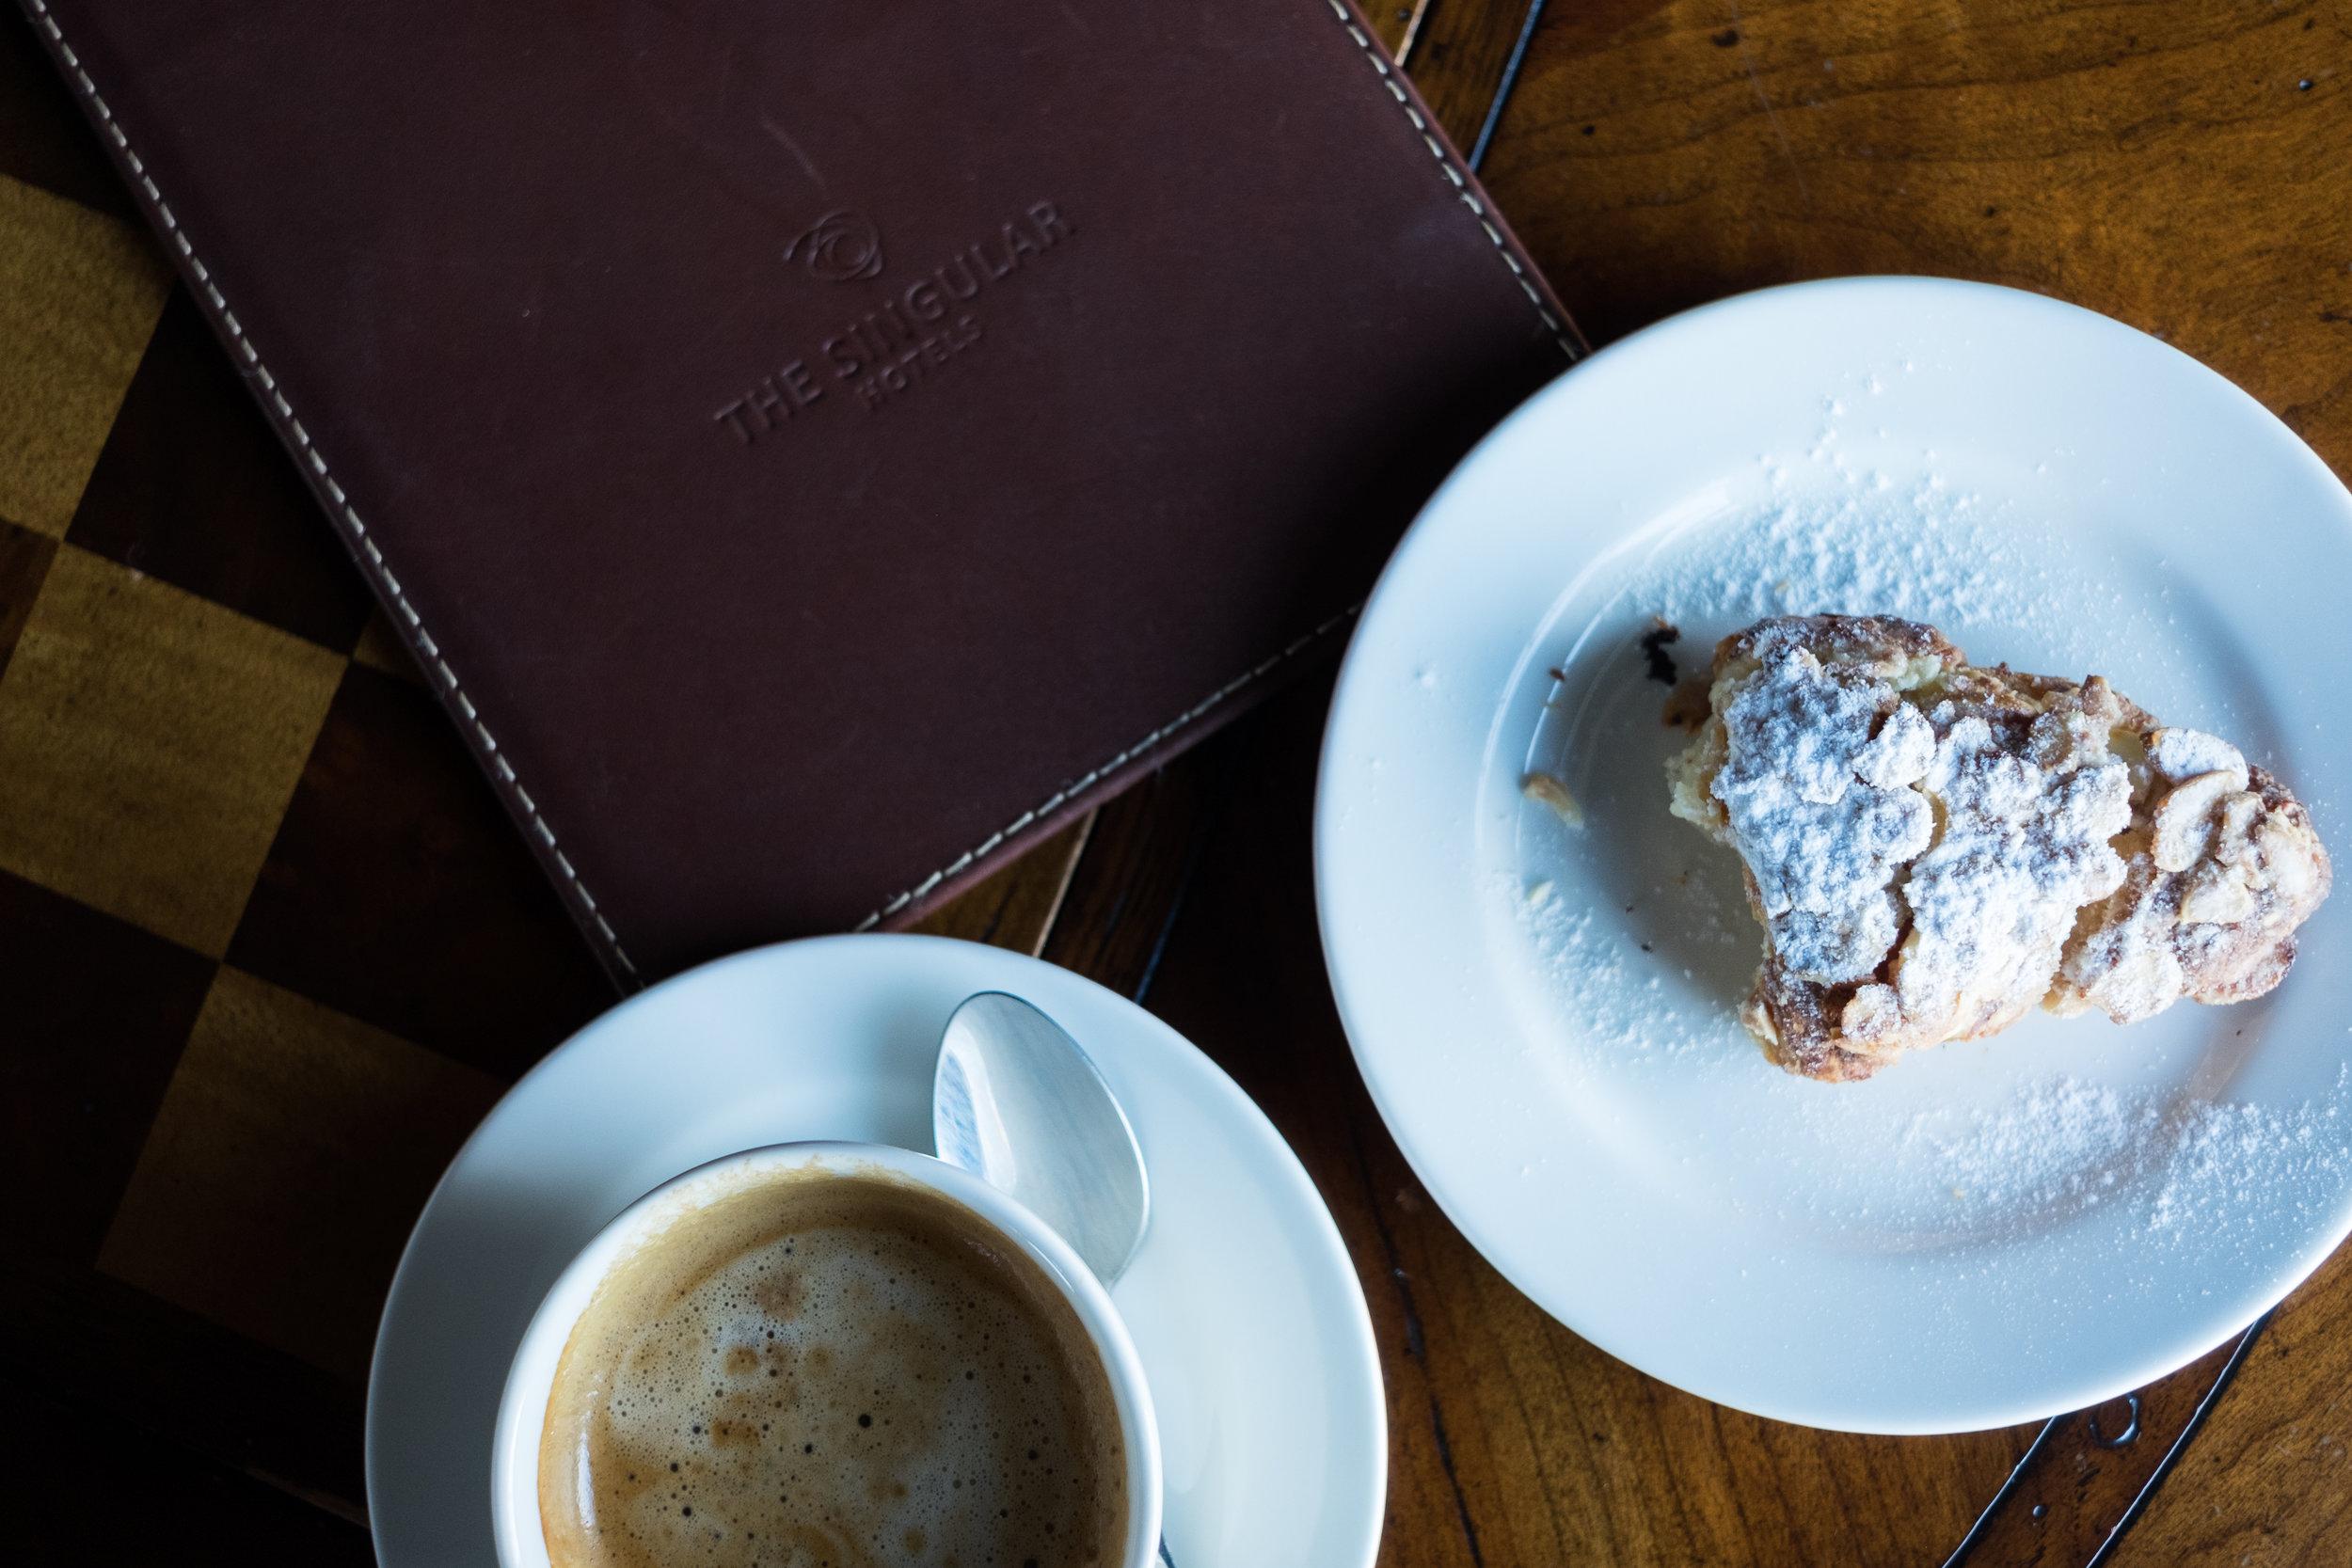 Morning coffee & croissants at The Singular